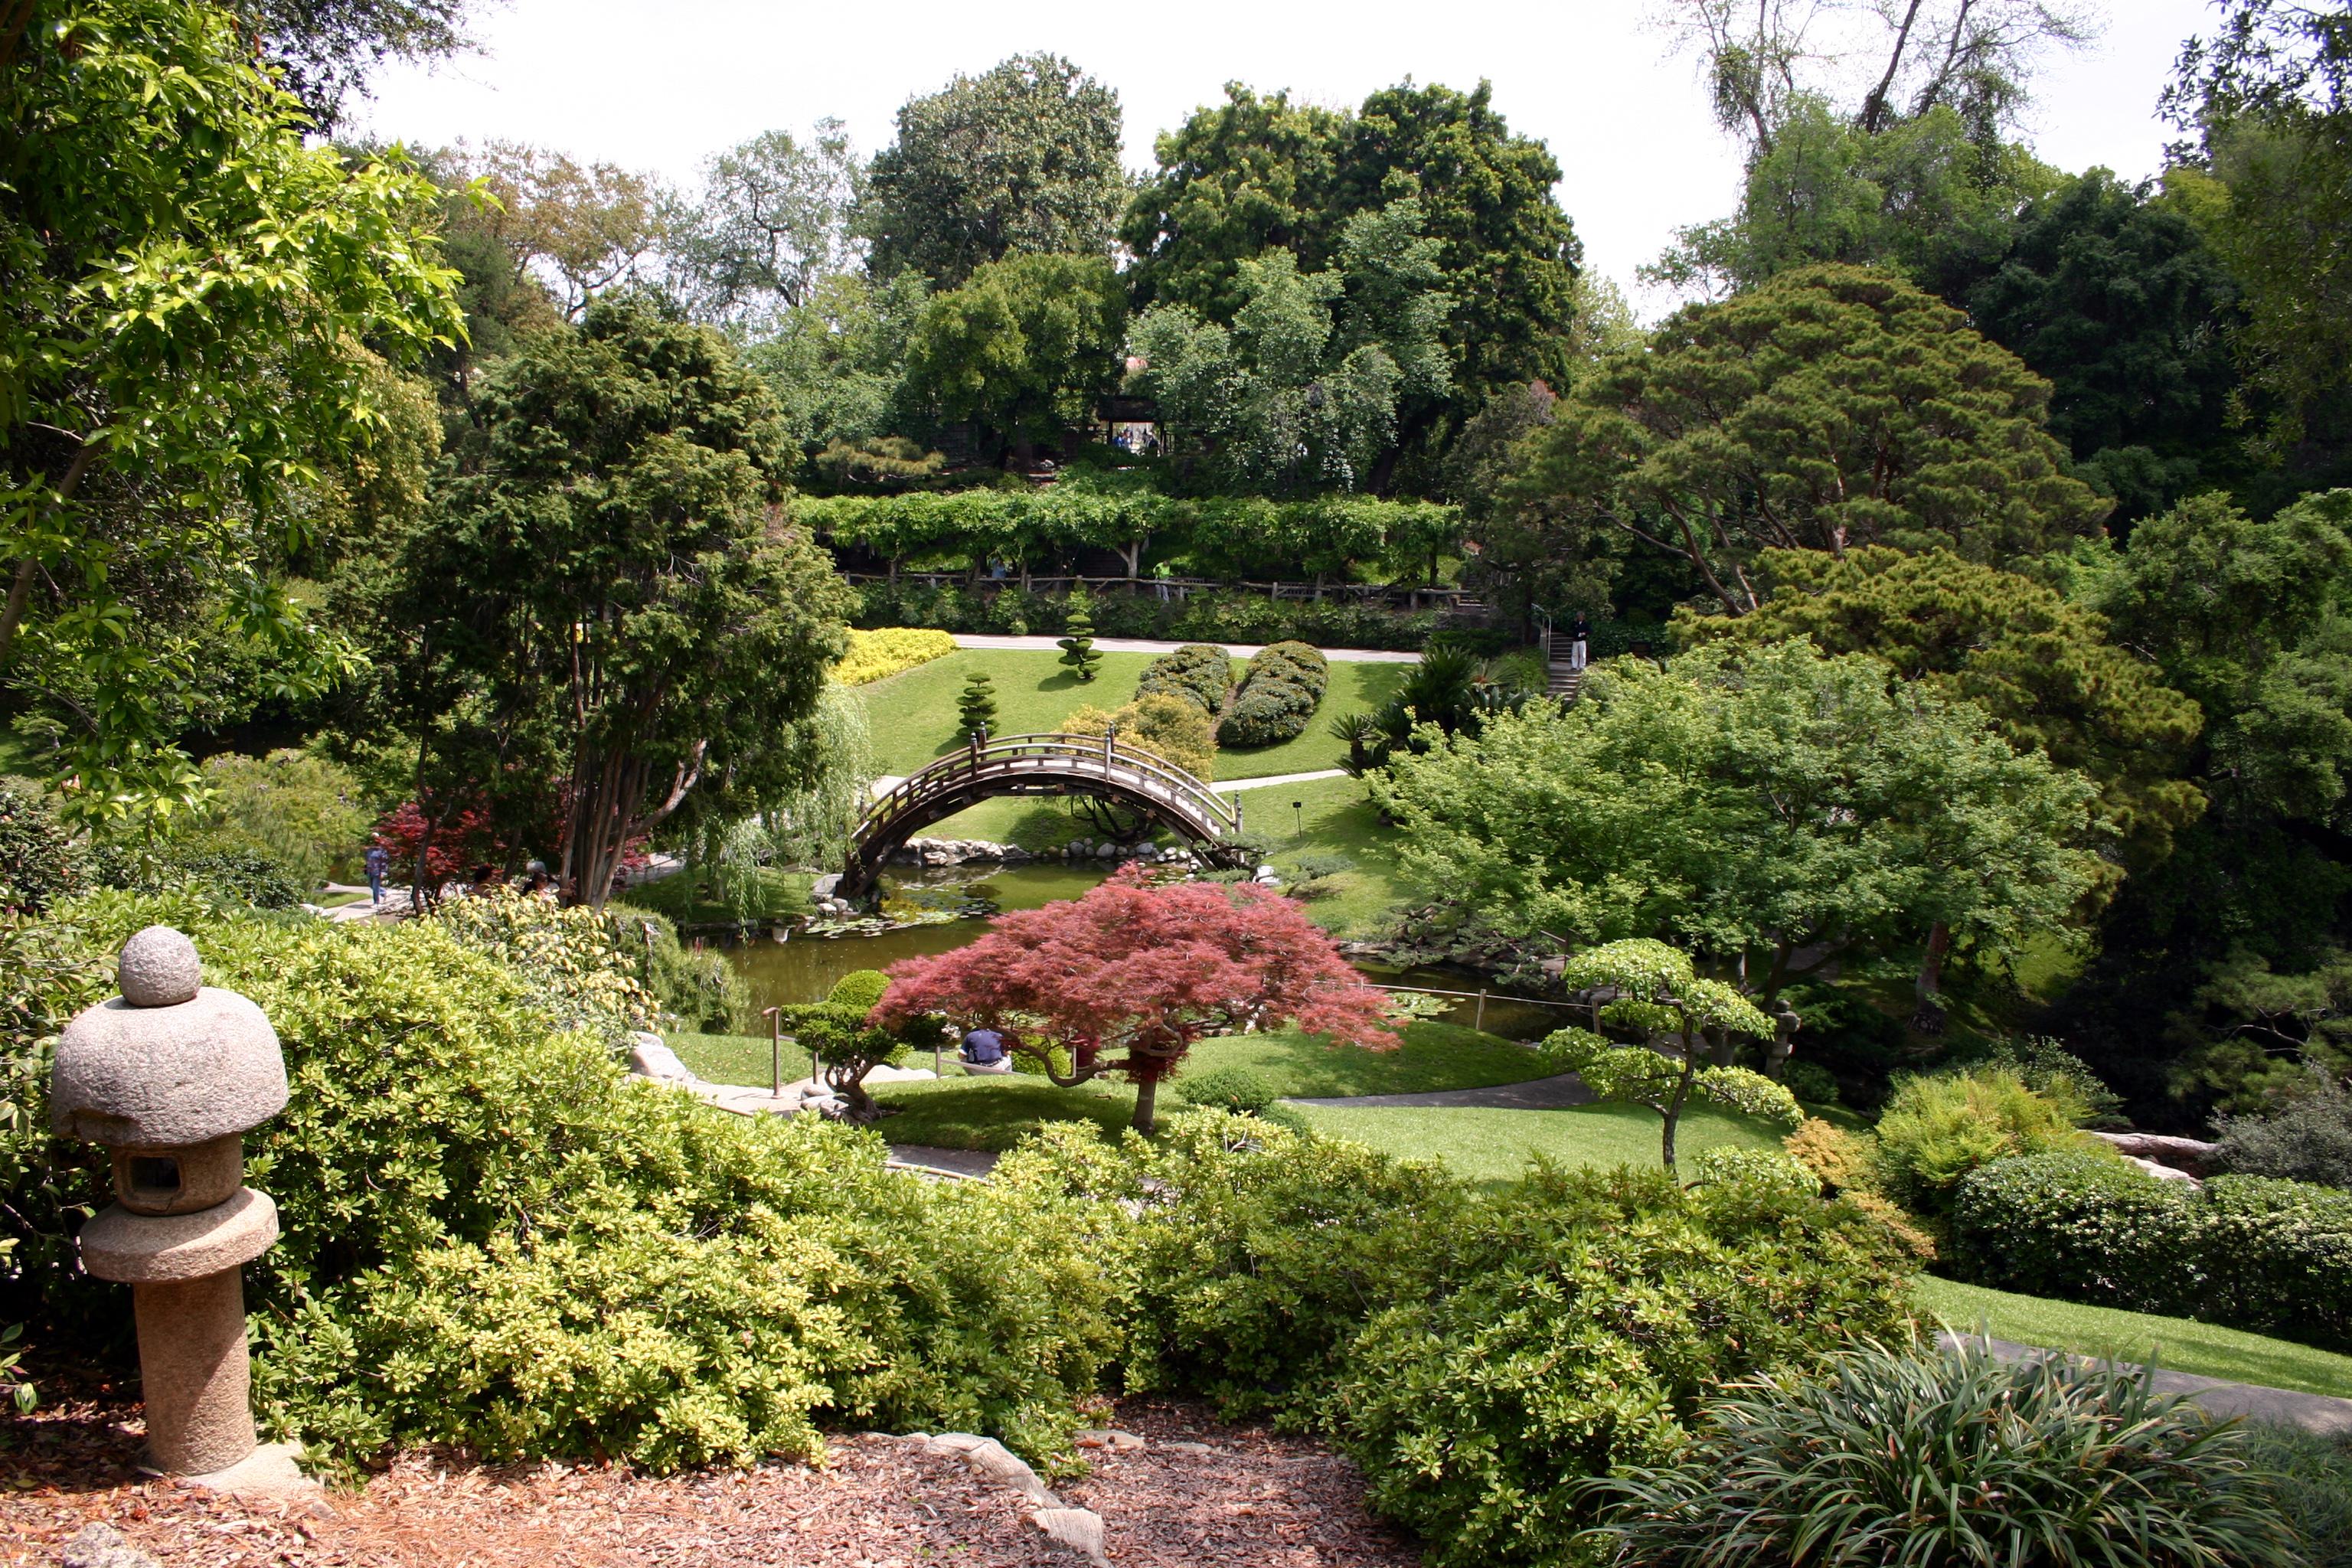 Japanese gardens at the huntington explore california - Huntington beach botanical garden ...